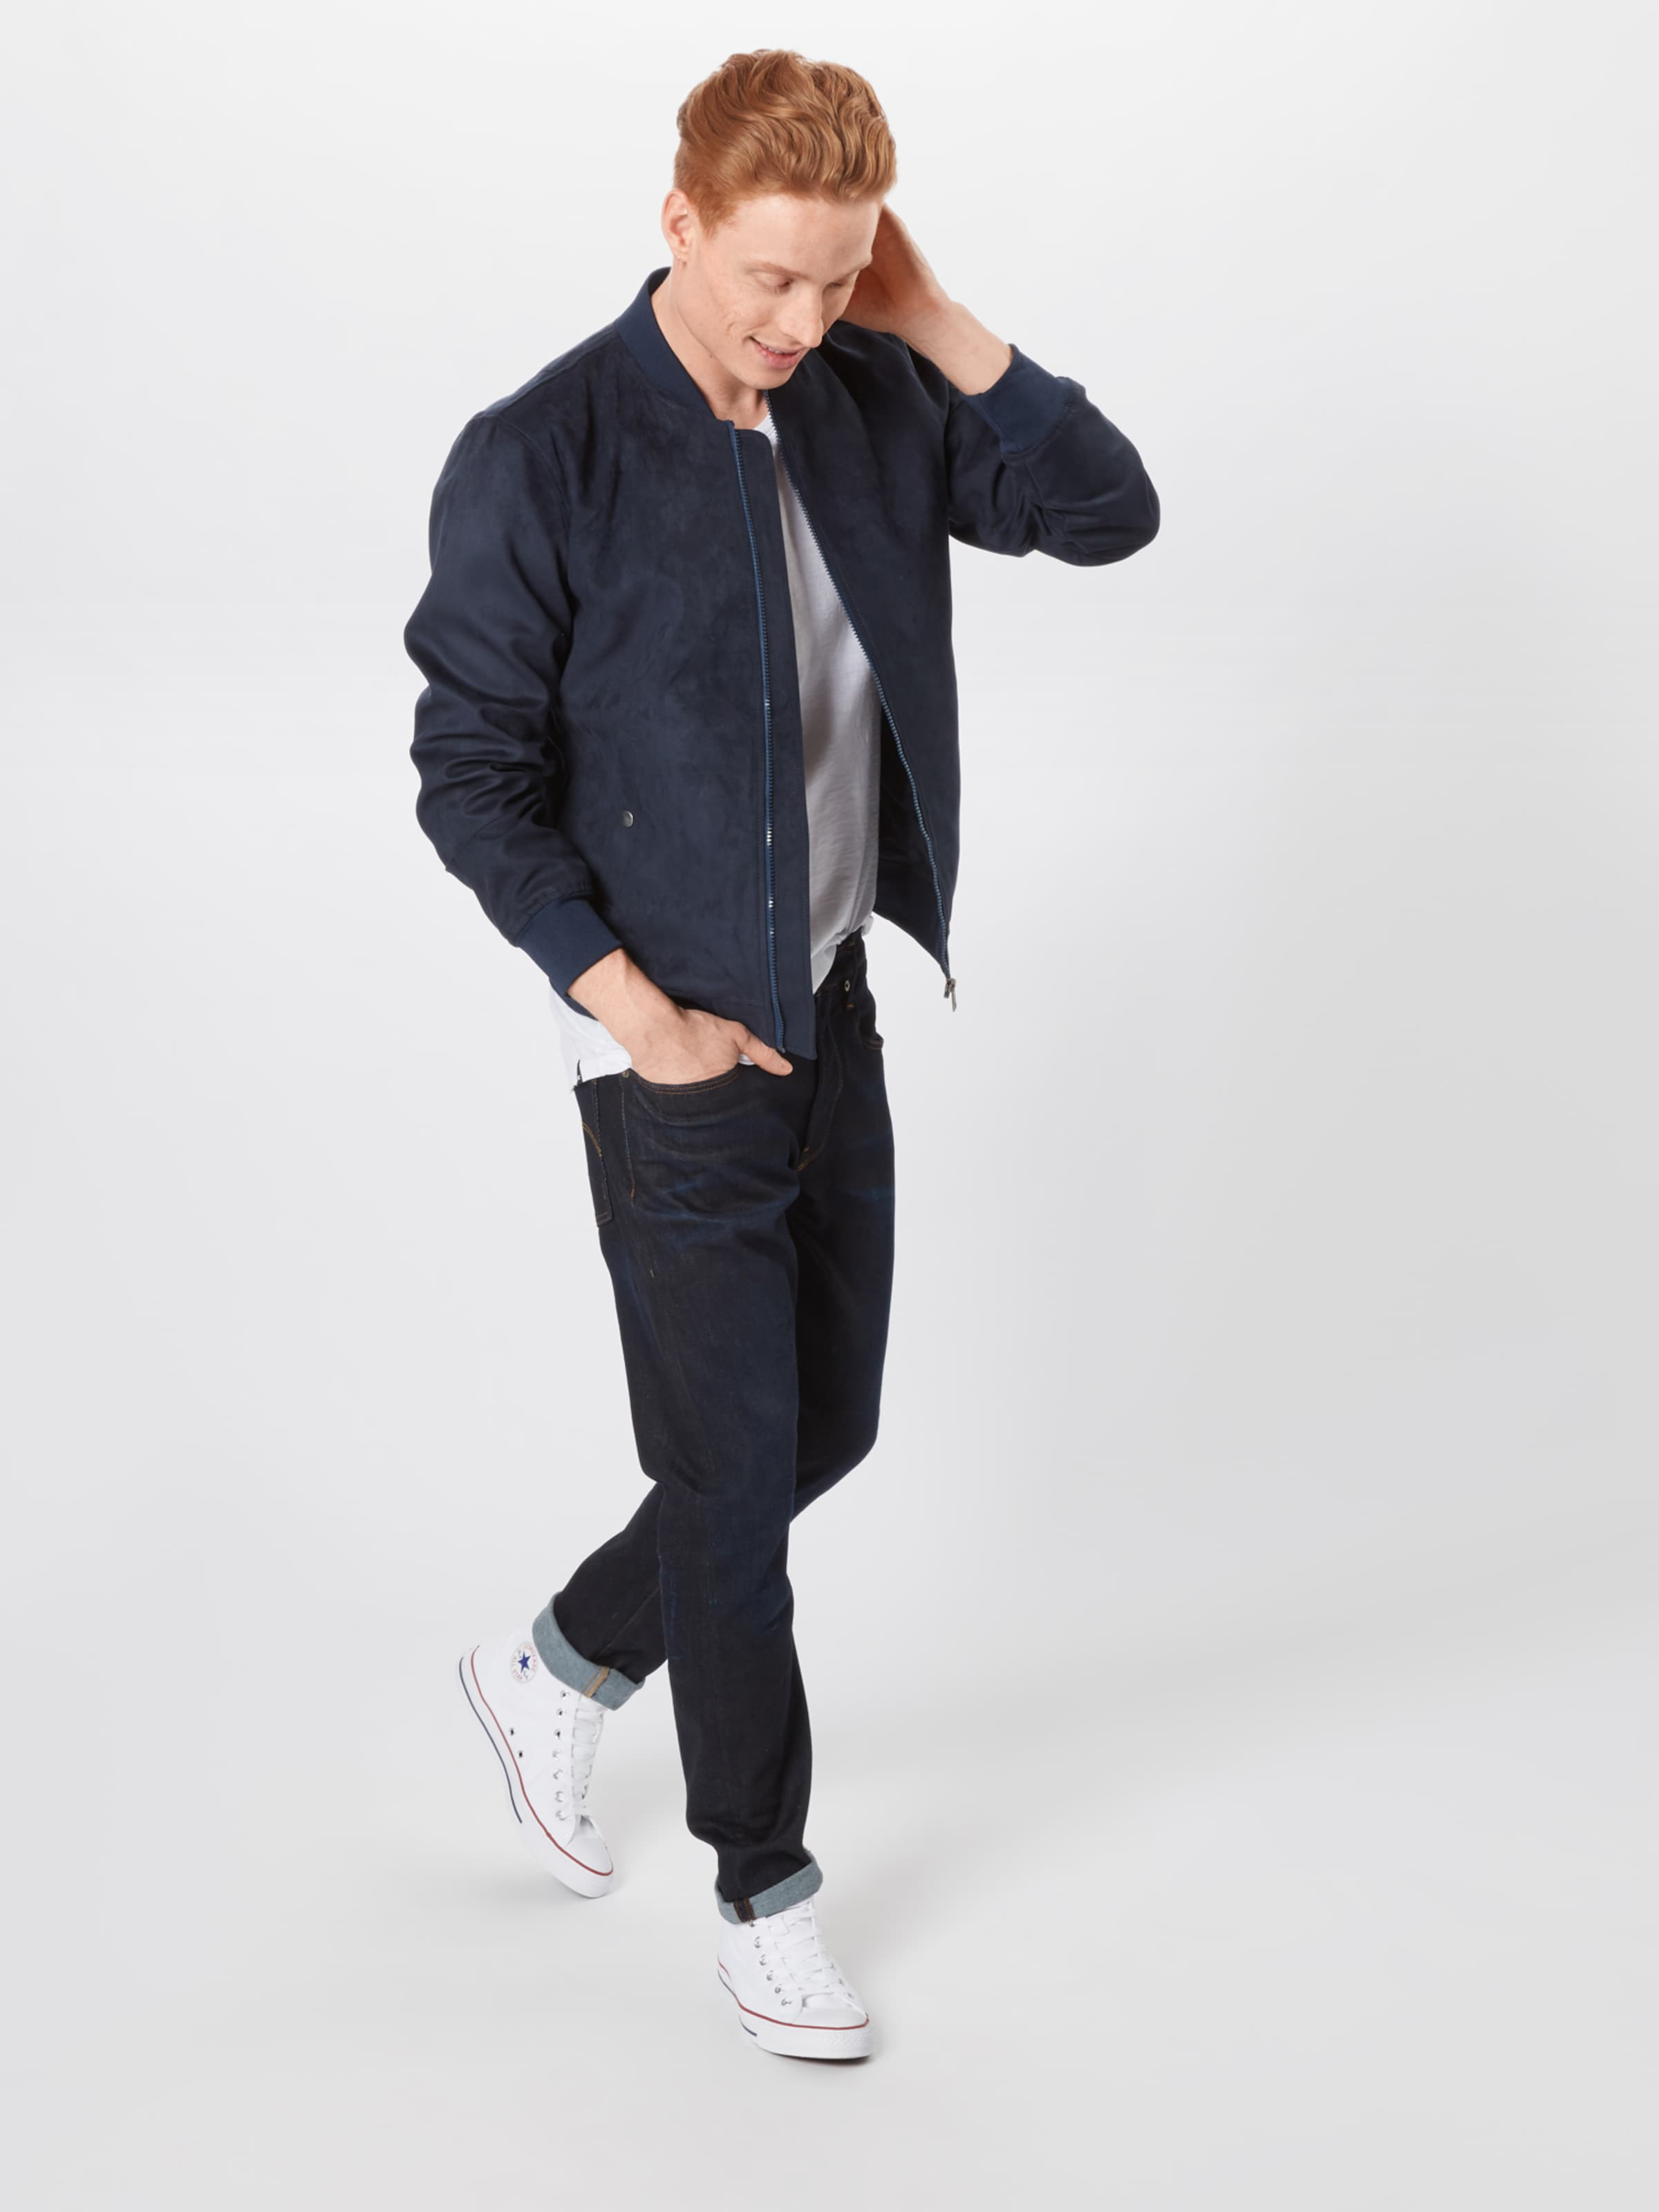 'ingo Slc' Tee T Denham shirt En Blanc KlF1TJc